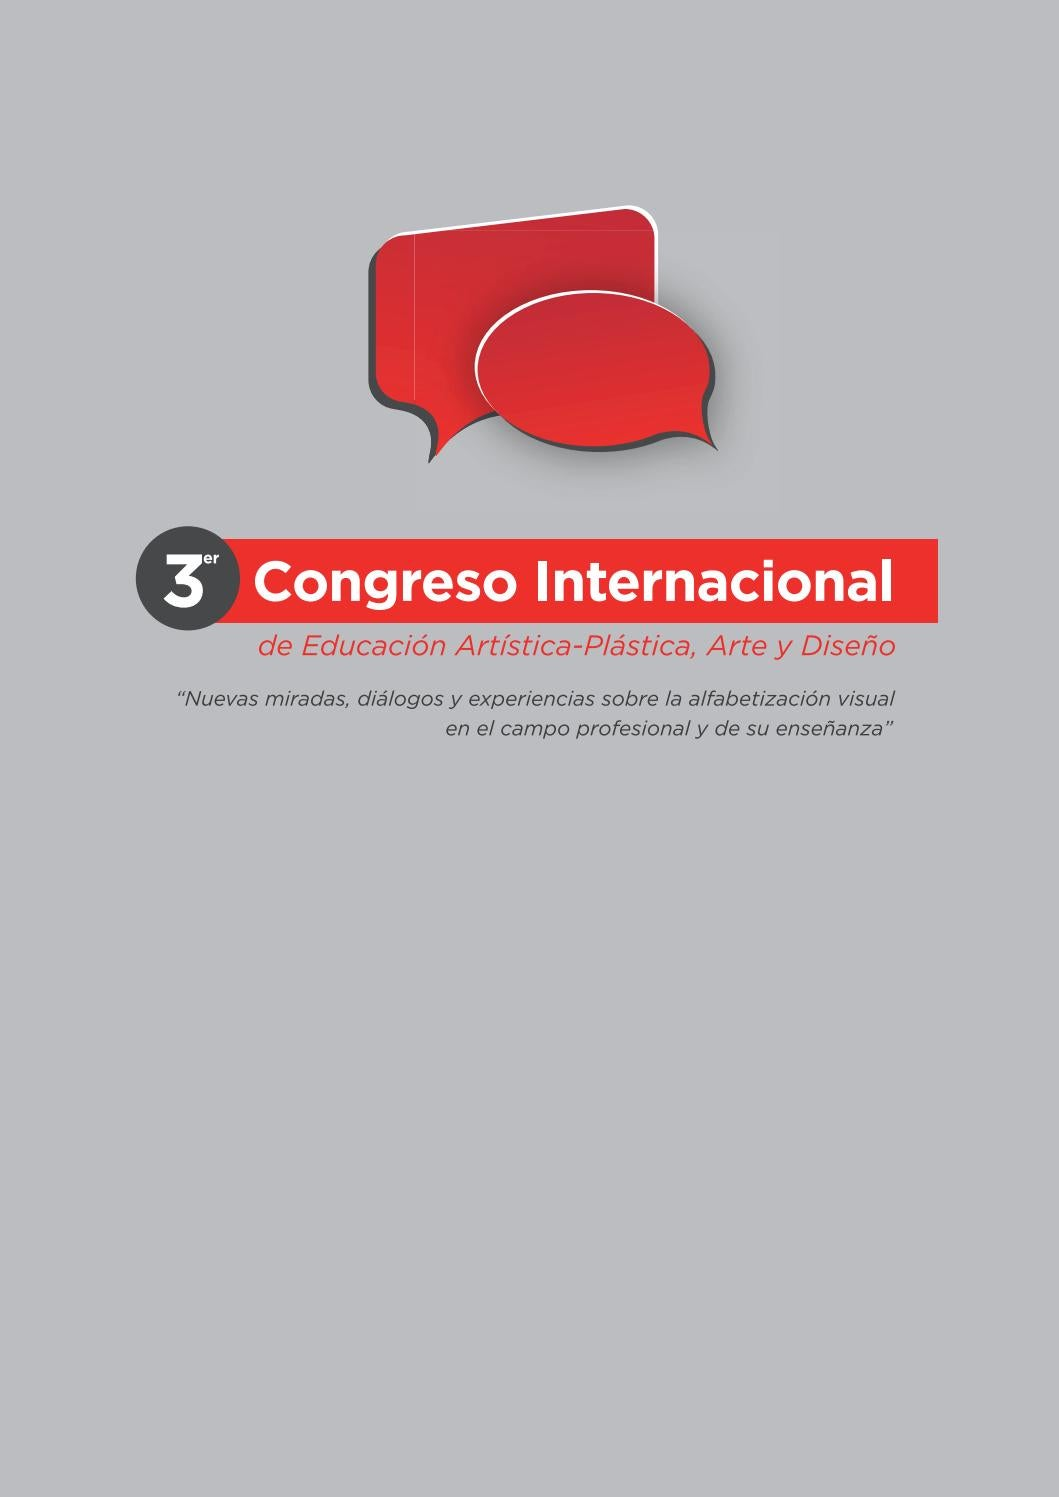 Libro 3er Congreso Internacional de Educación Artística-Plástica ...